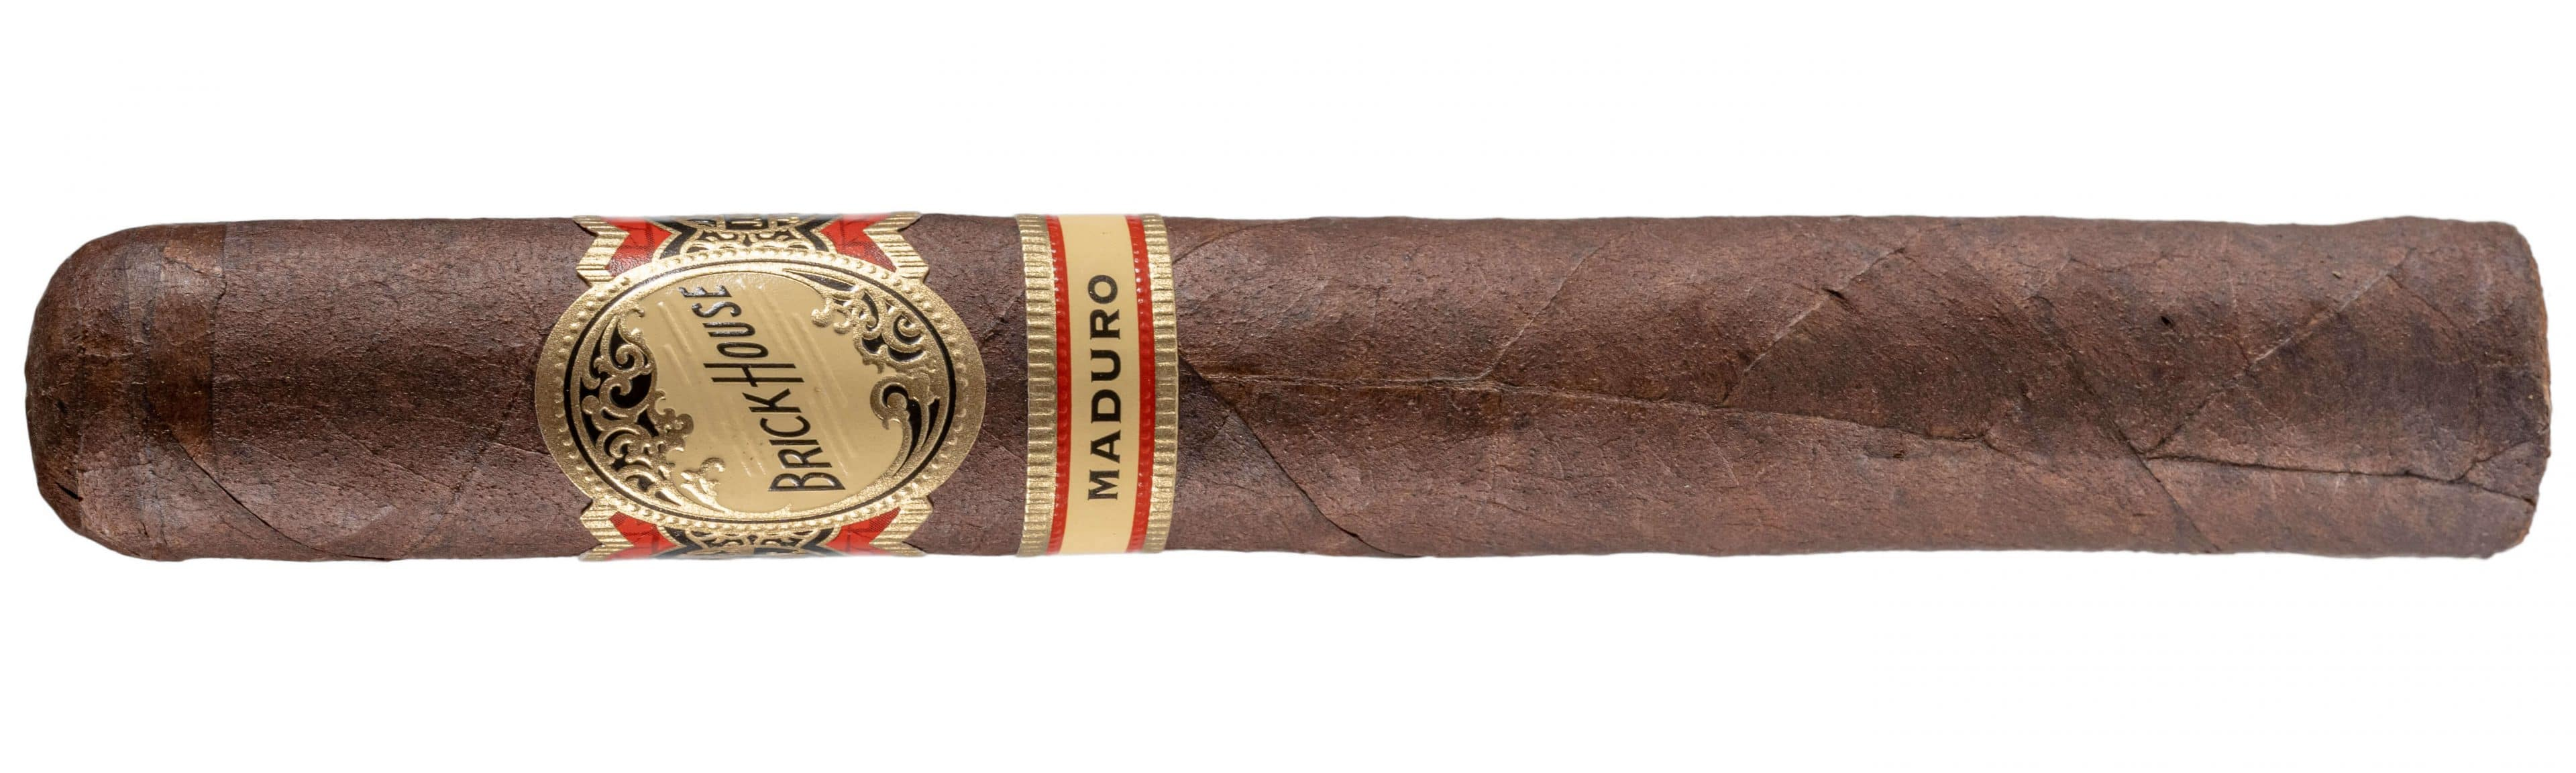 Blind Cigar Review: Brick House | Maduro Toro